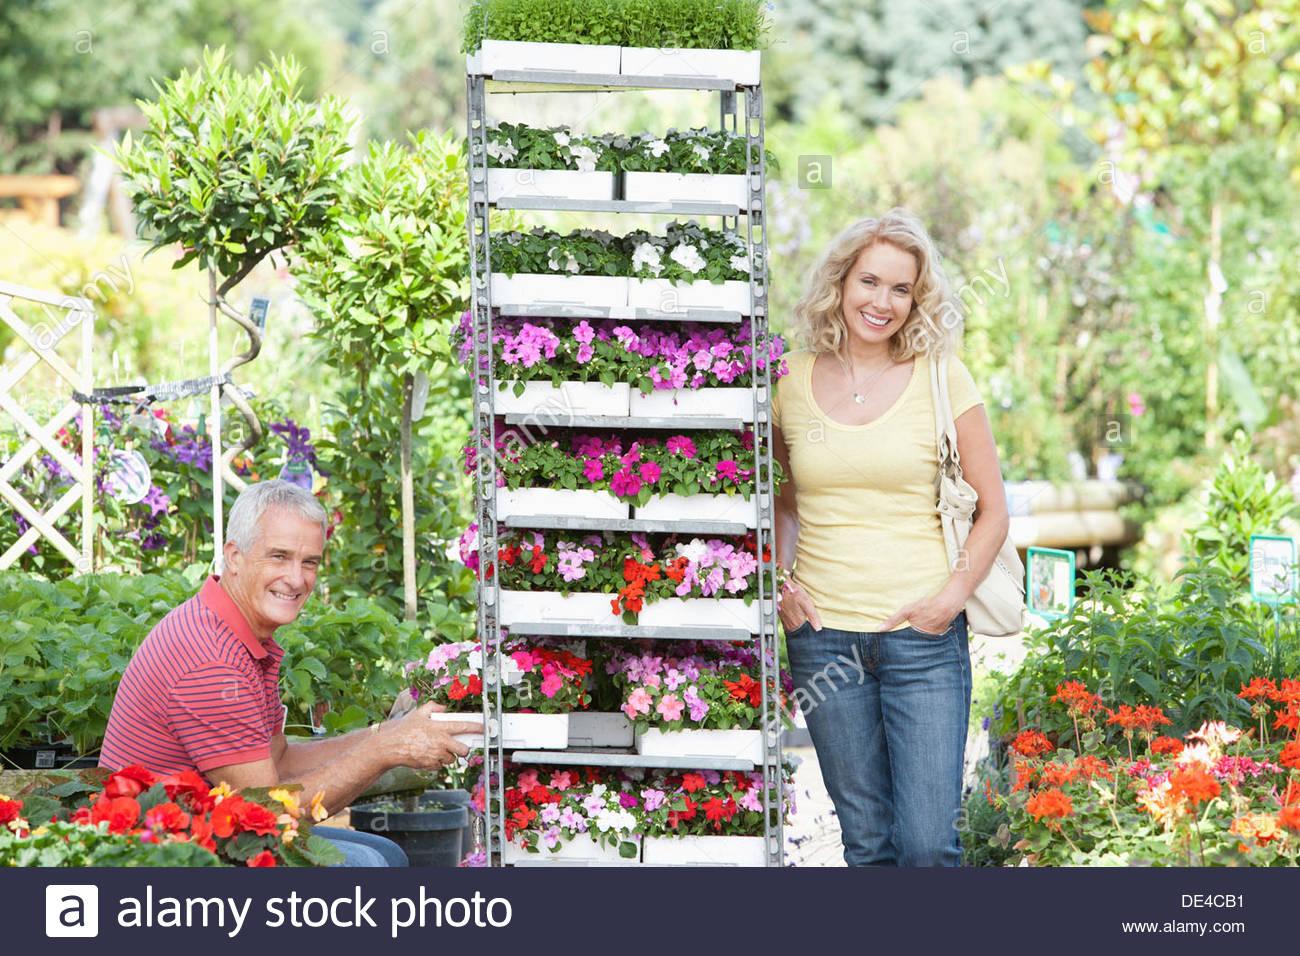 Couple buying flowers in nursery - Stock Image